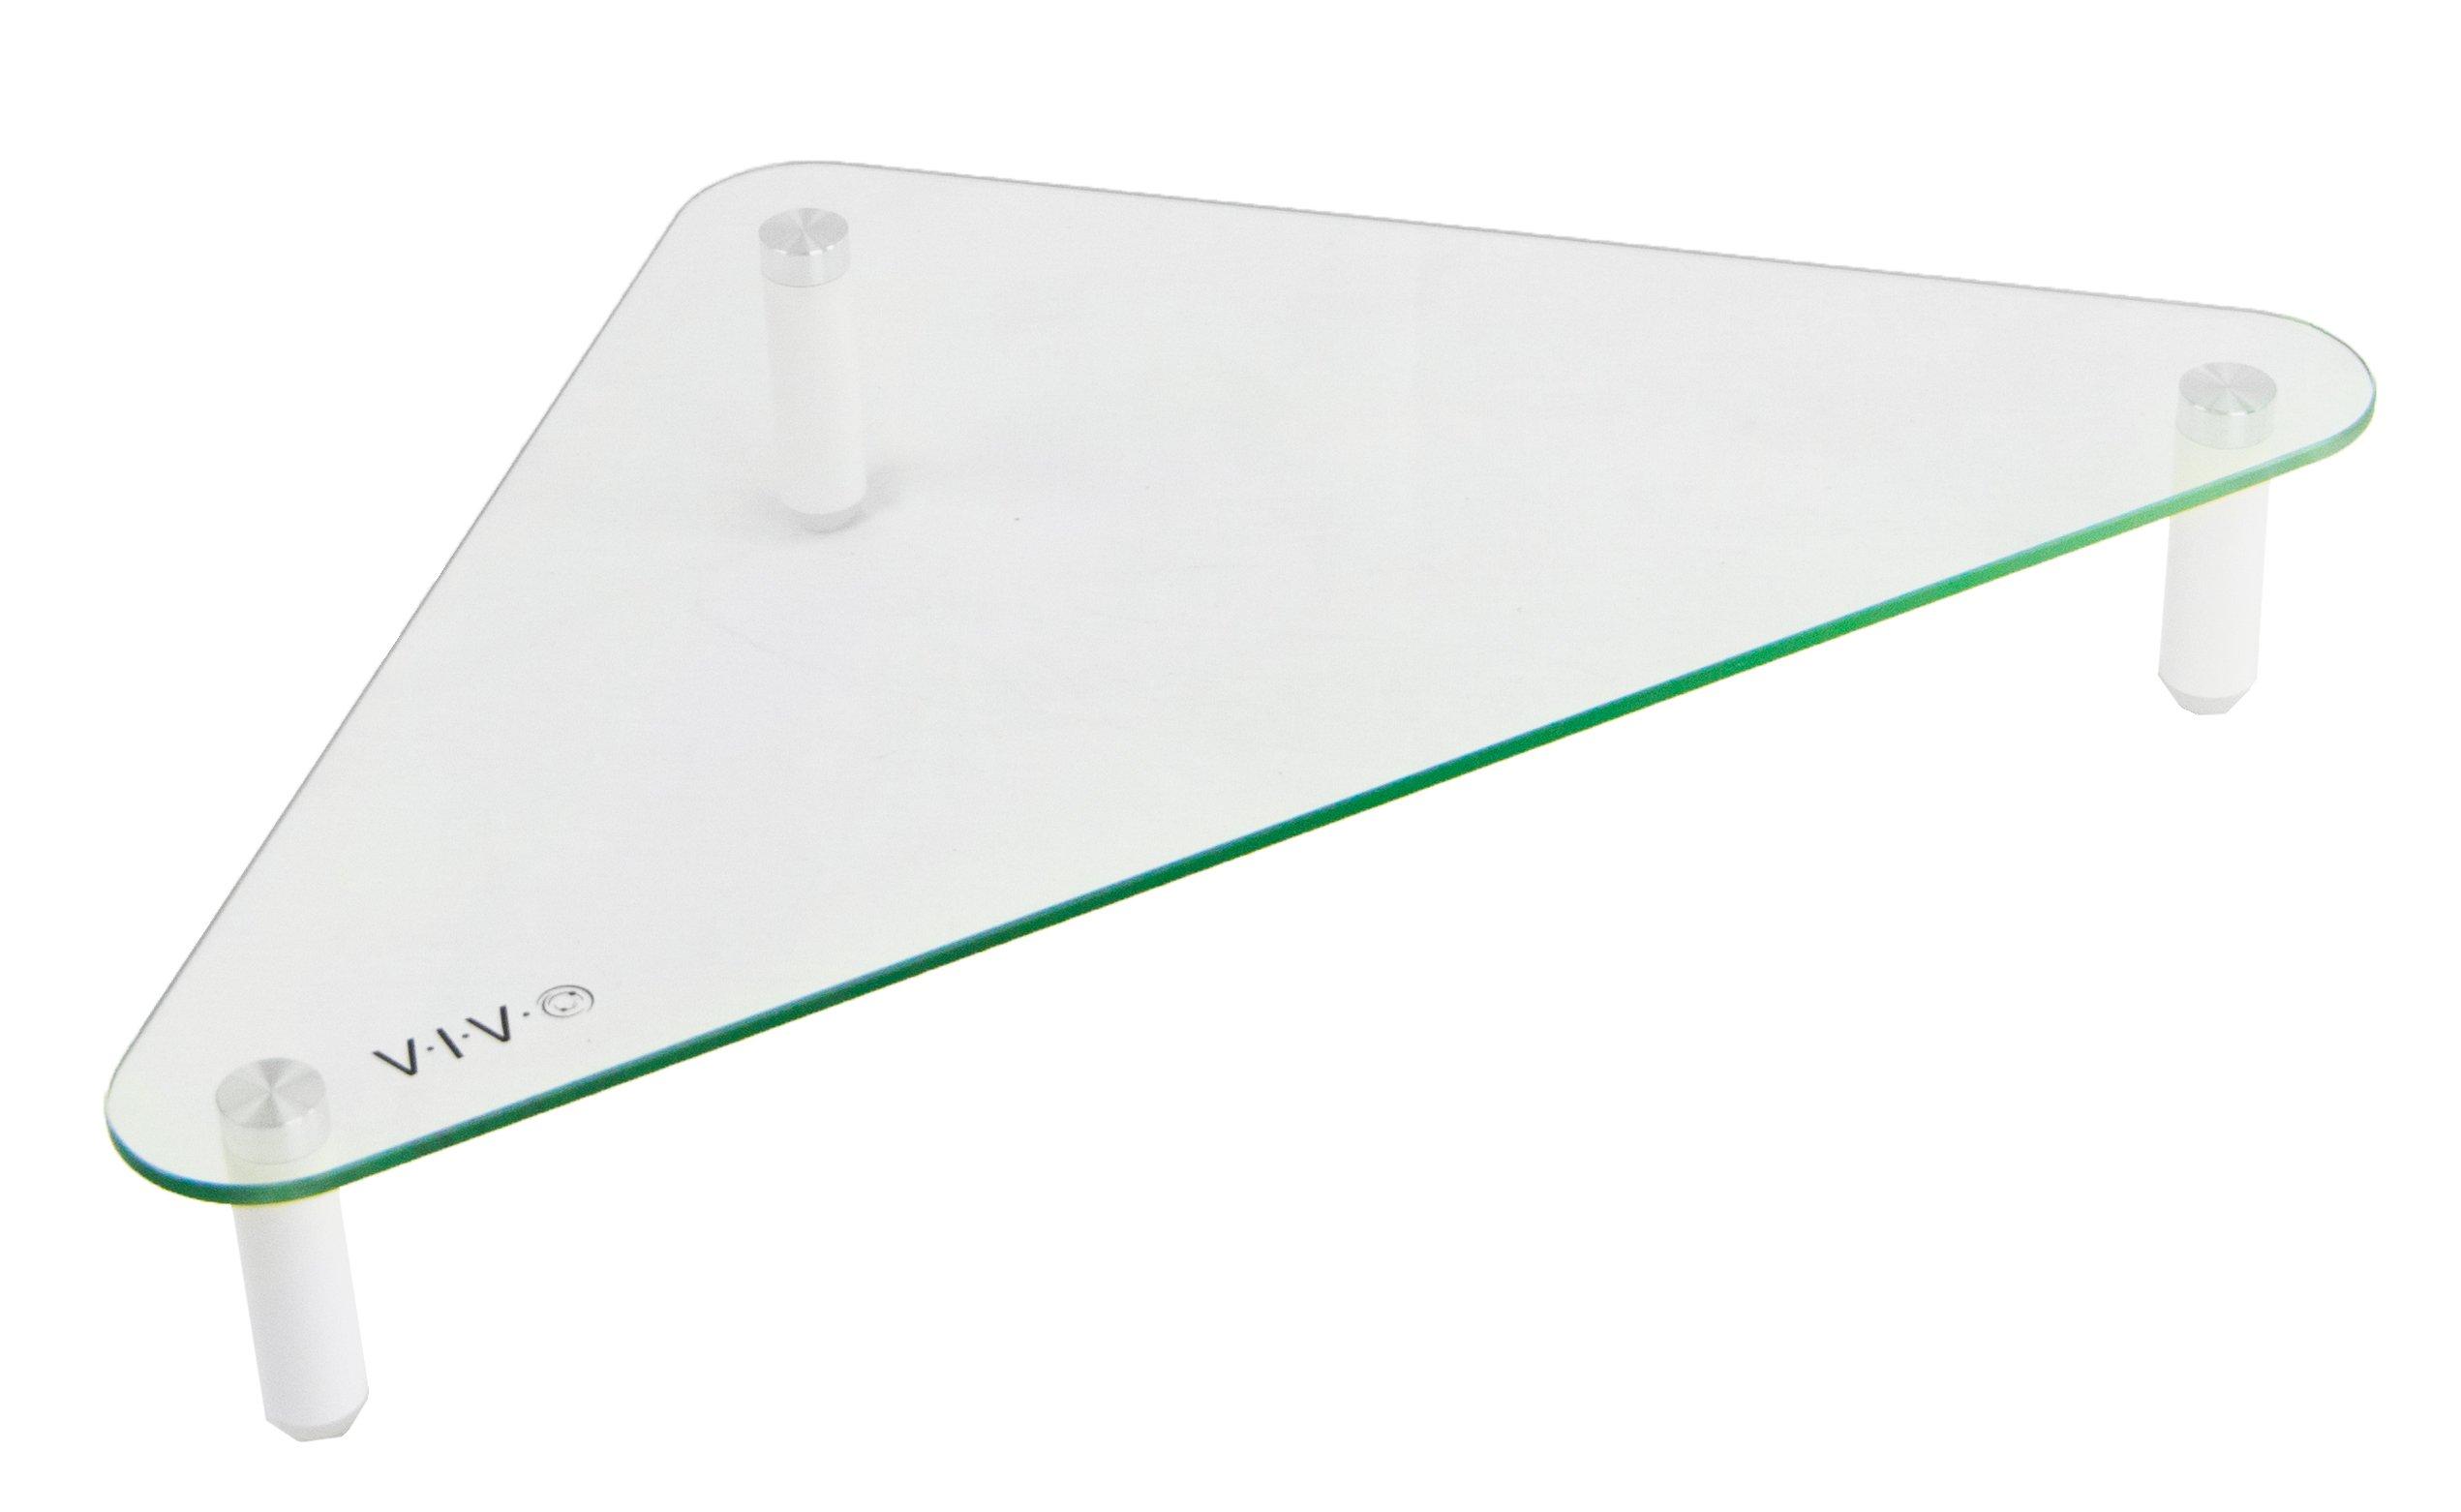 VIVO Glass Ergonomic Tabletop Riser | Triangle Desktop Universal Corner Stand for Computer Monitor & Laptop (STAND-V000Q)